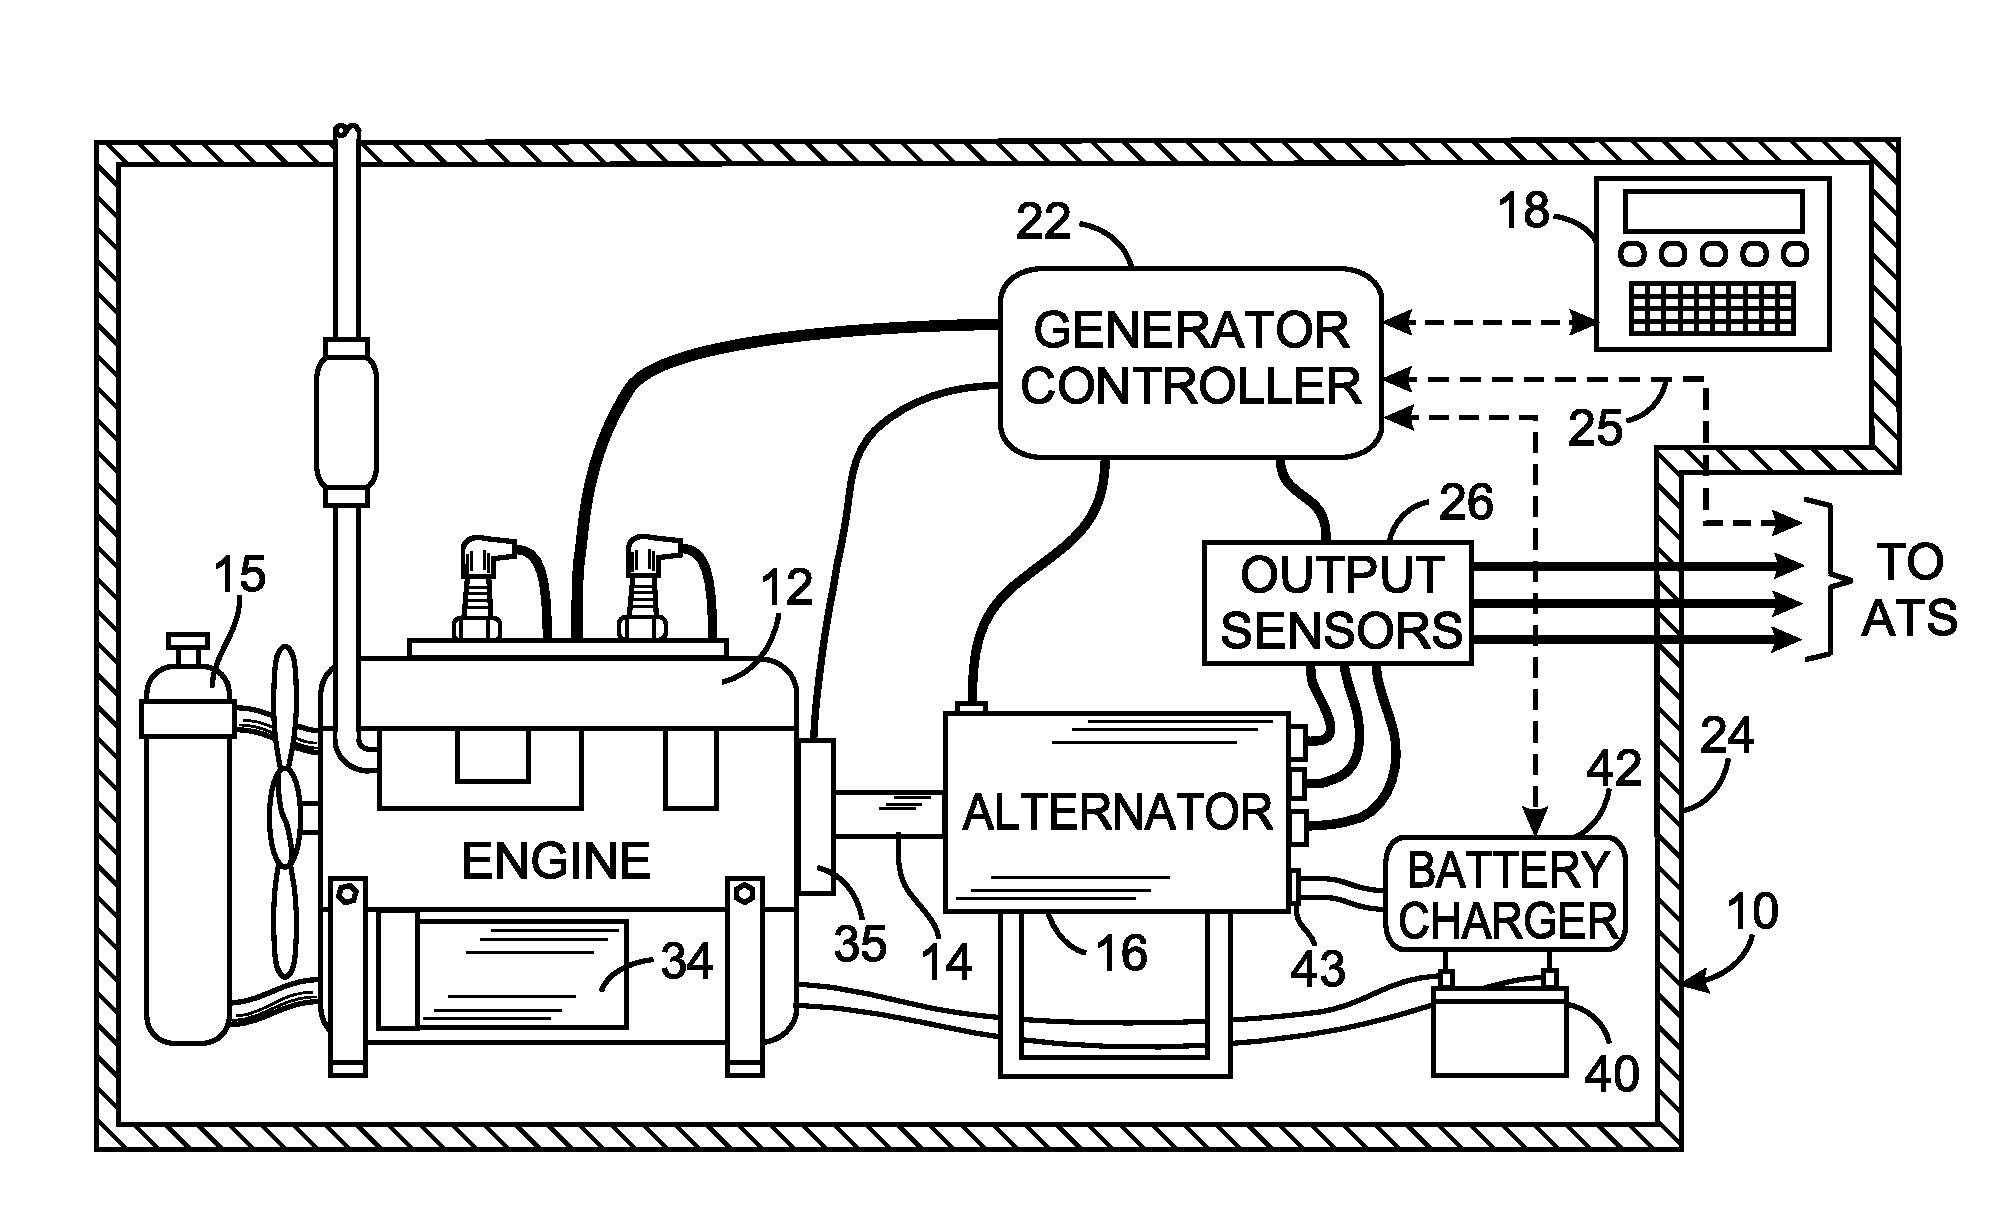 diesel generator control panel wiring diagram trailer electric brakes engine drawing at getdrawings free for